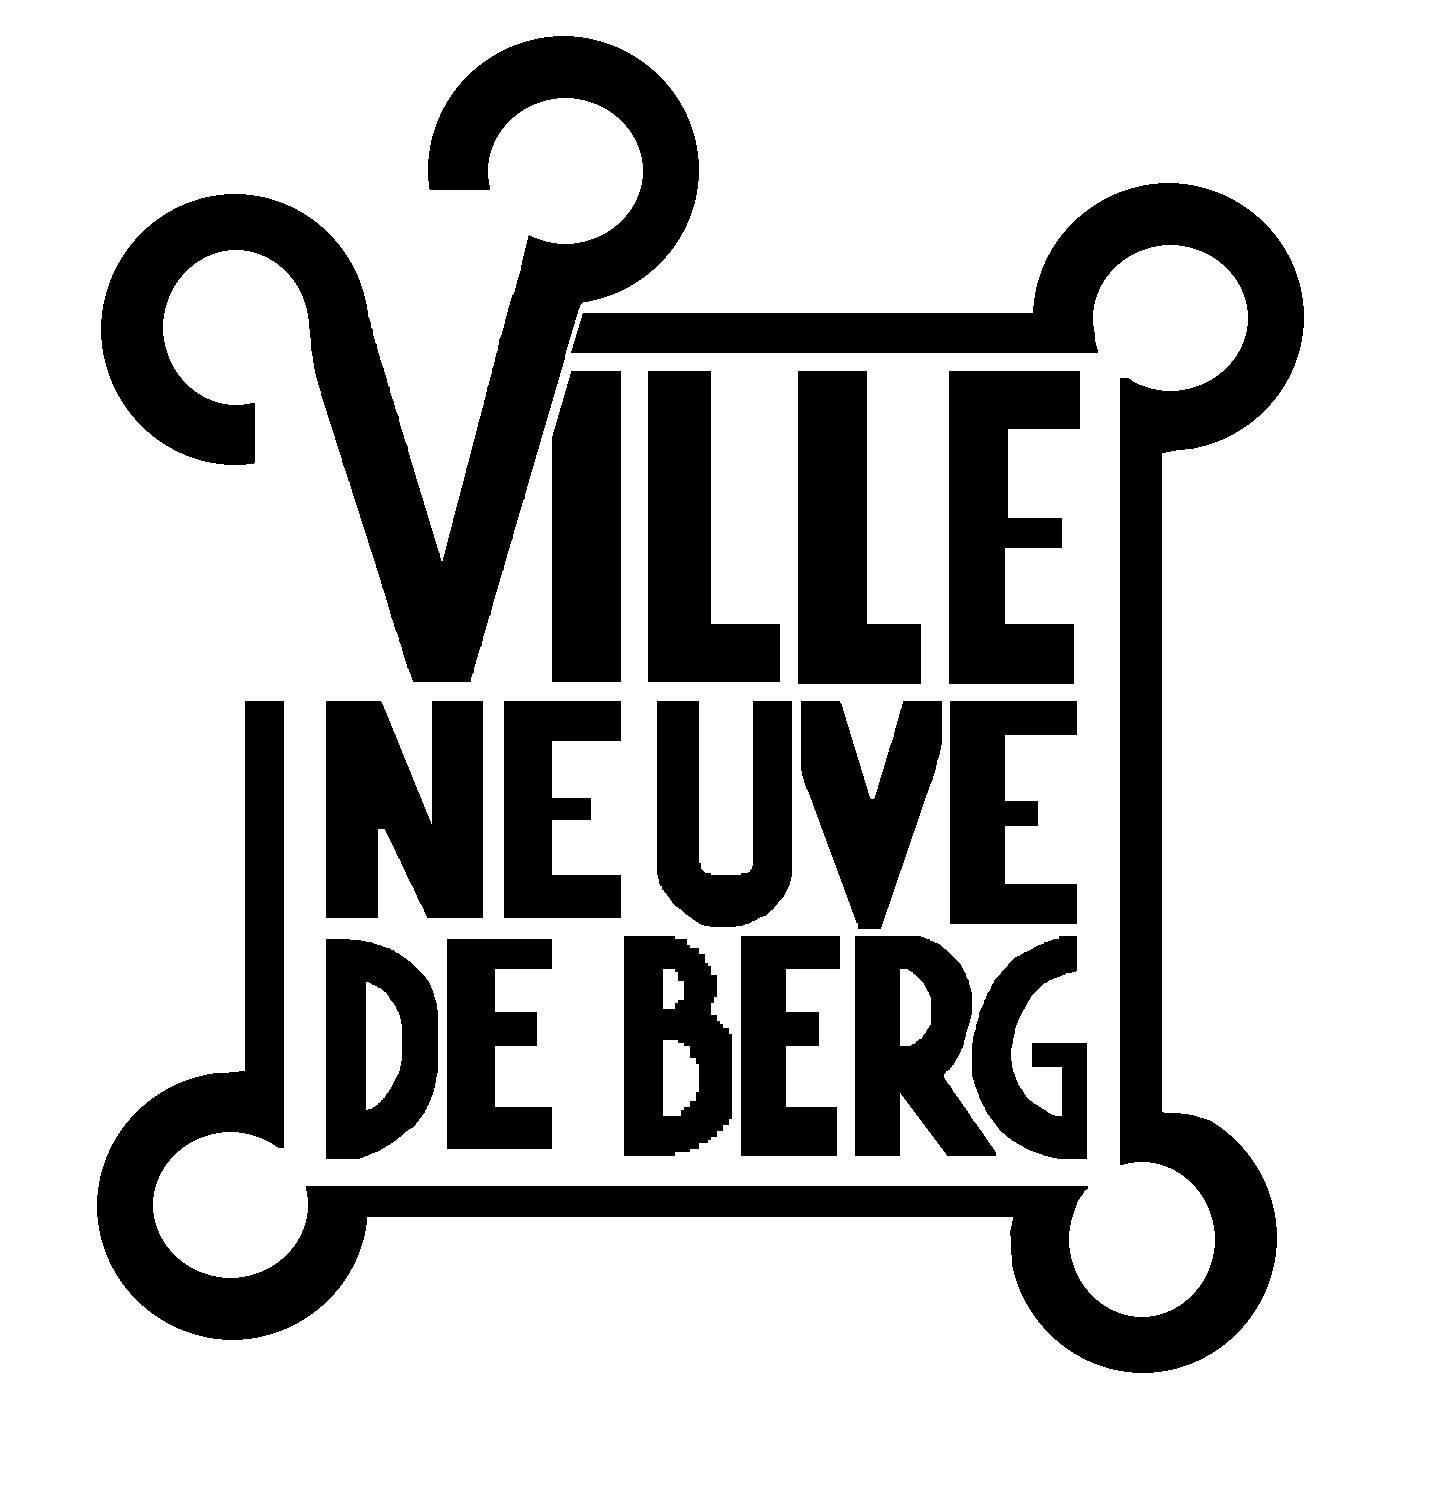 Logo villeneuve de Berg